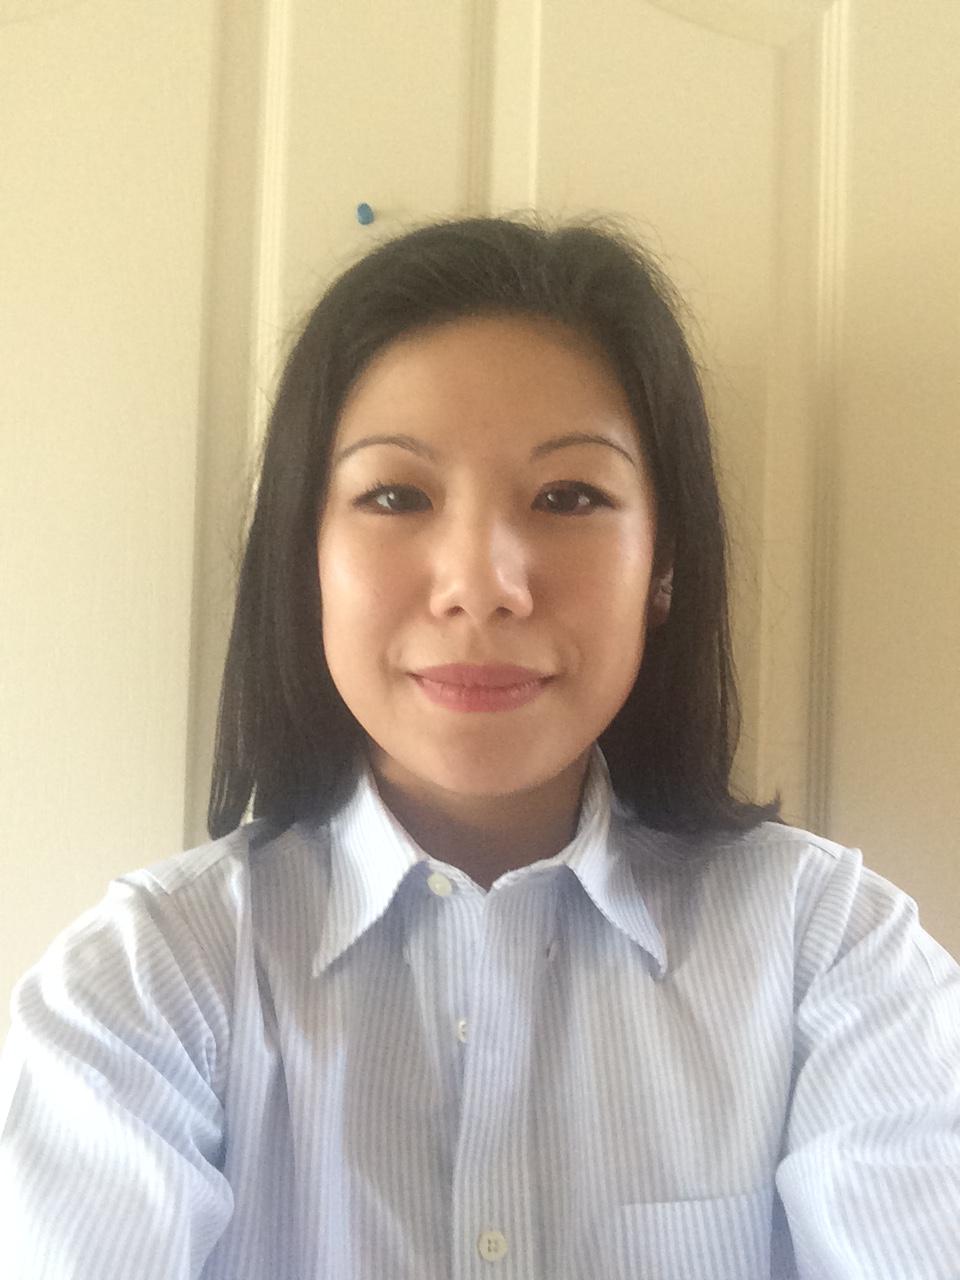 Minyi Zheng -  - Subject Matter Expert from Kolabtree